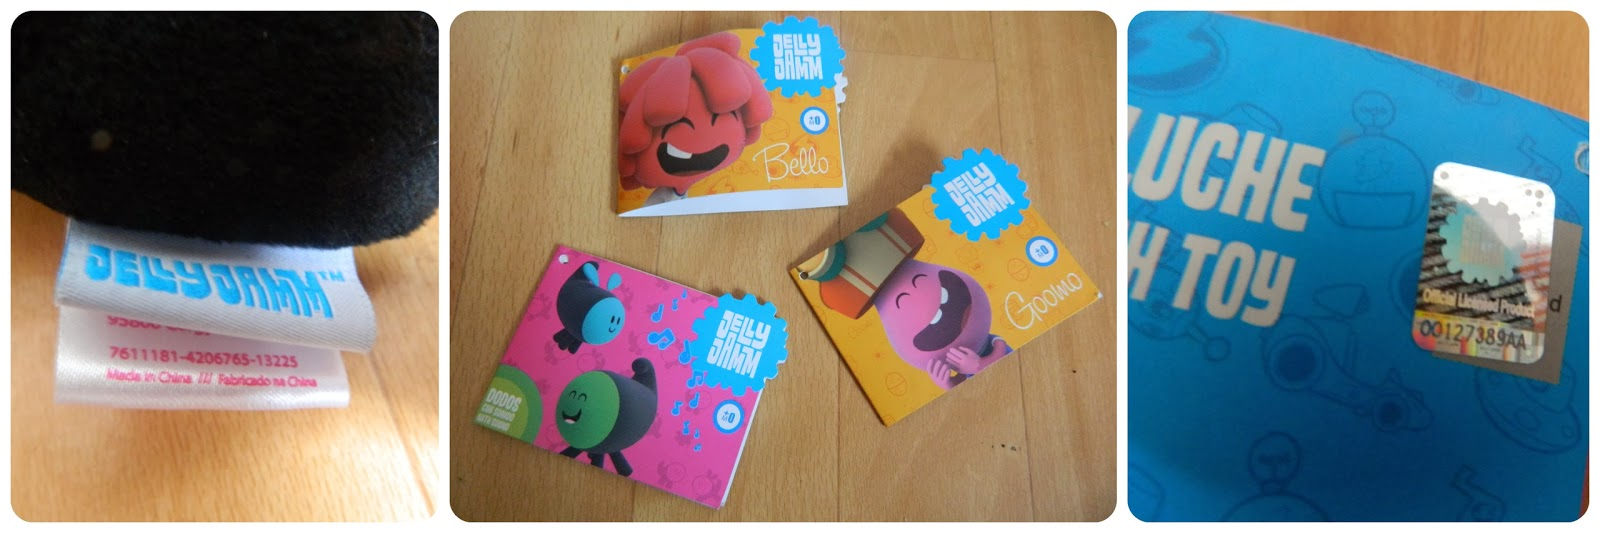 Jelly Jamm Plush toys range details